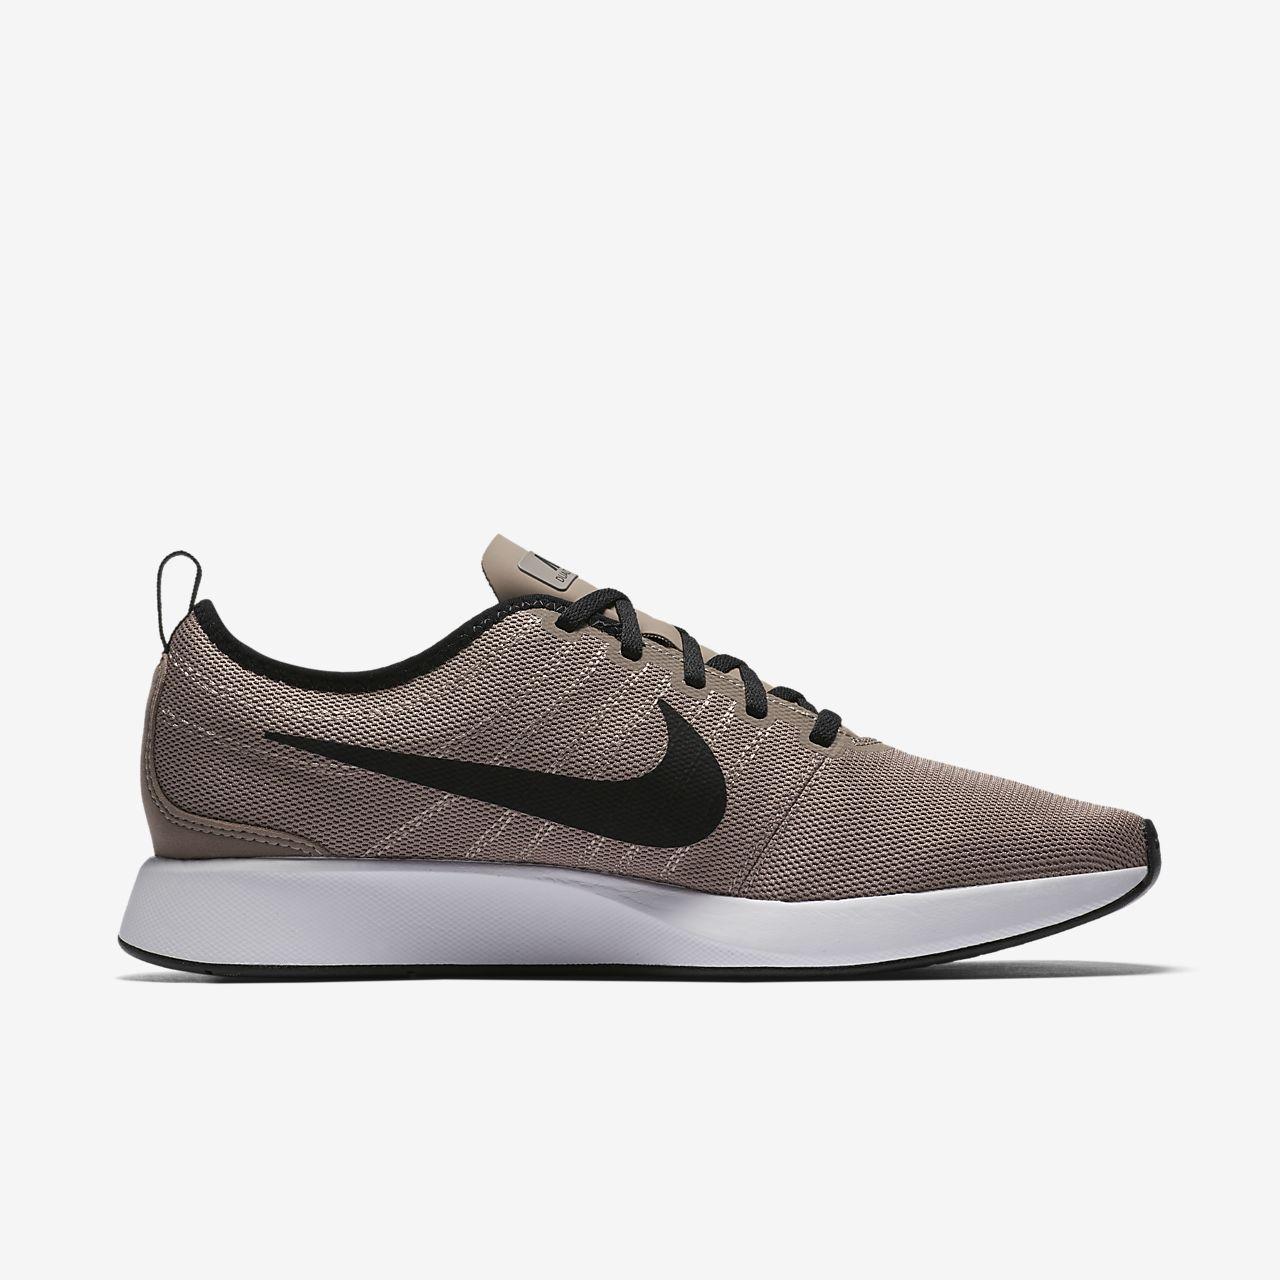 ... Nike Dualtone Racer Men's Shoe